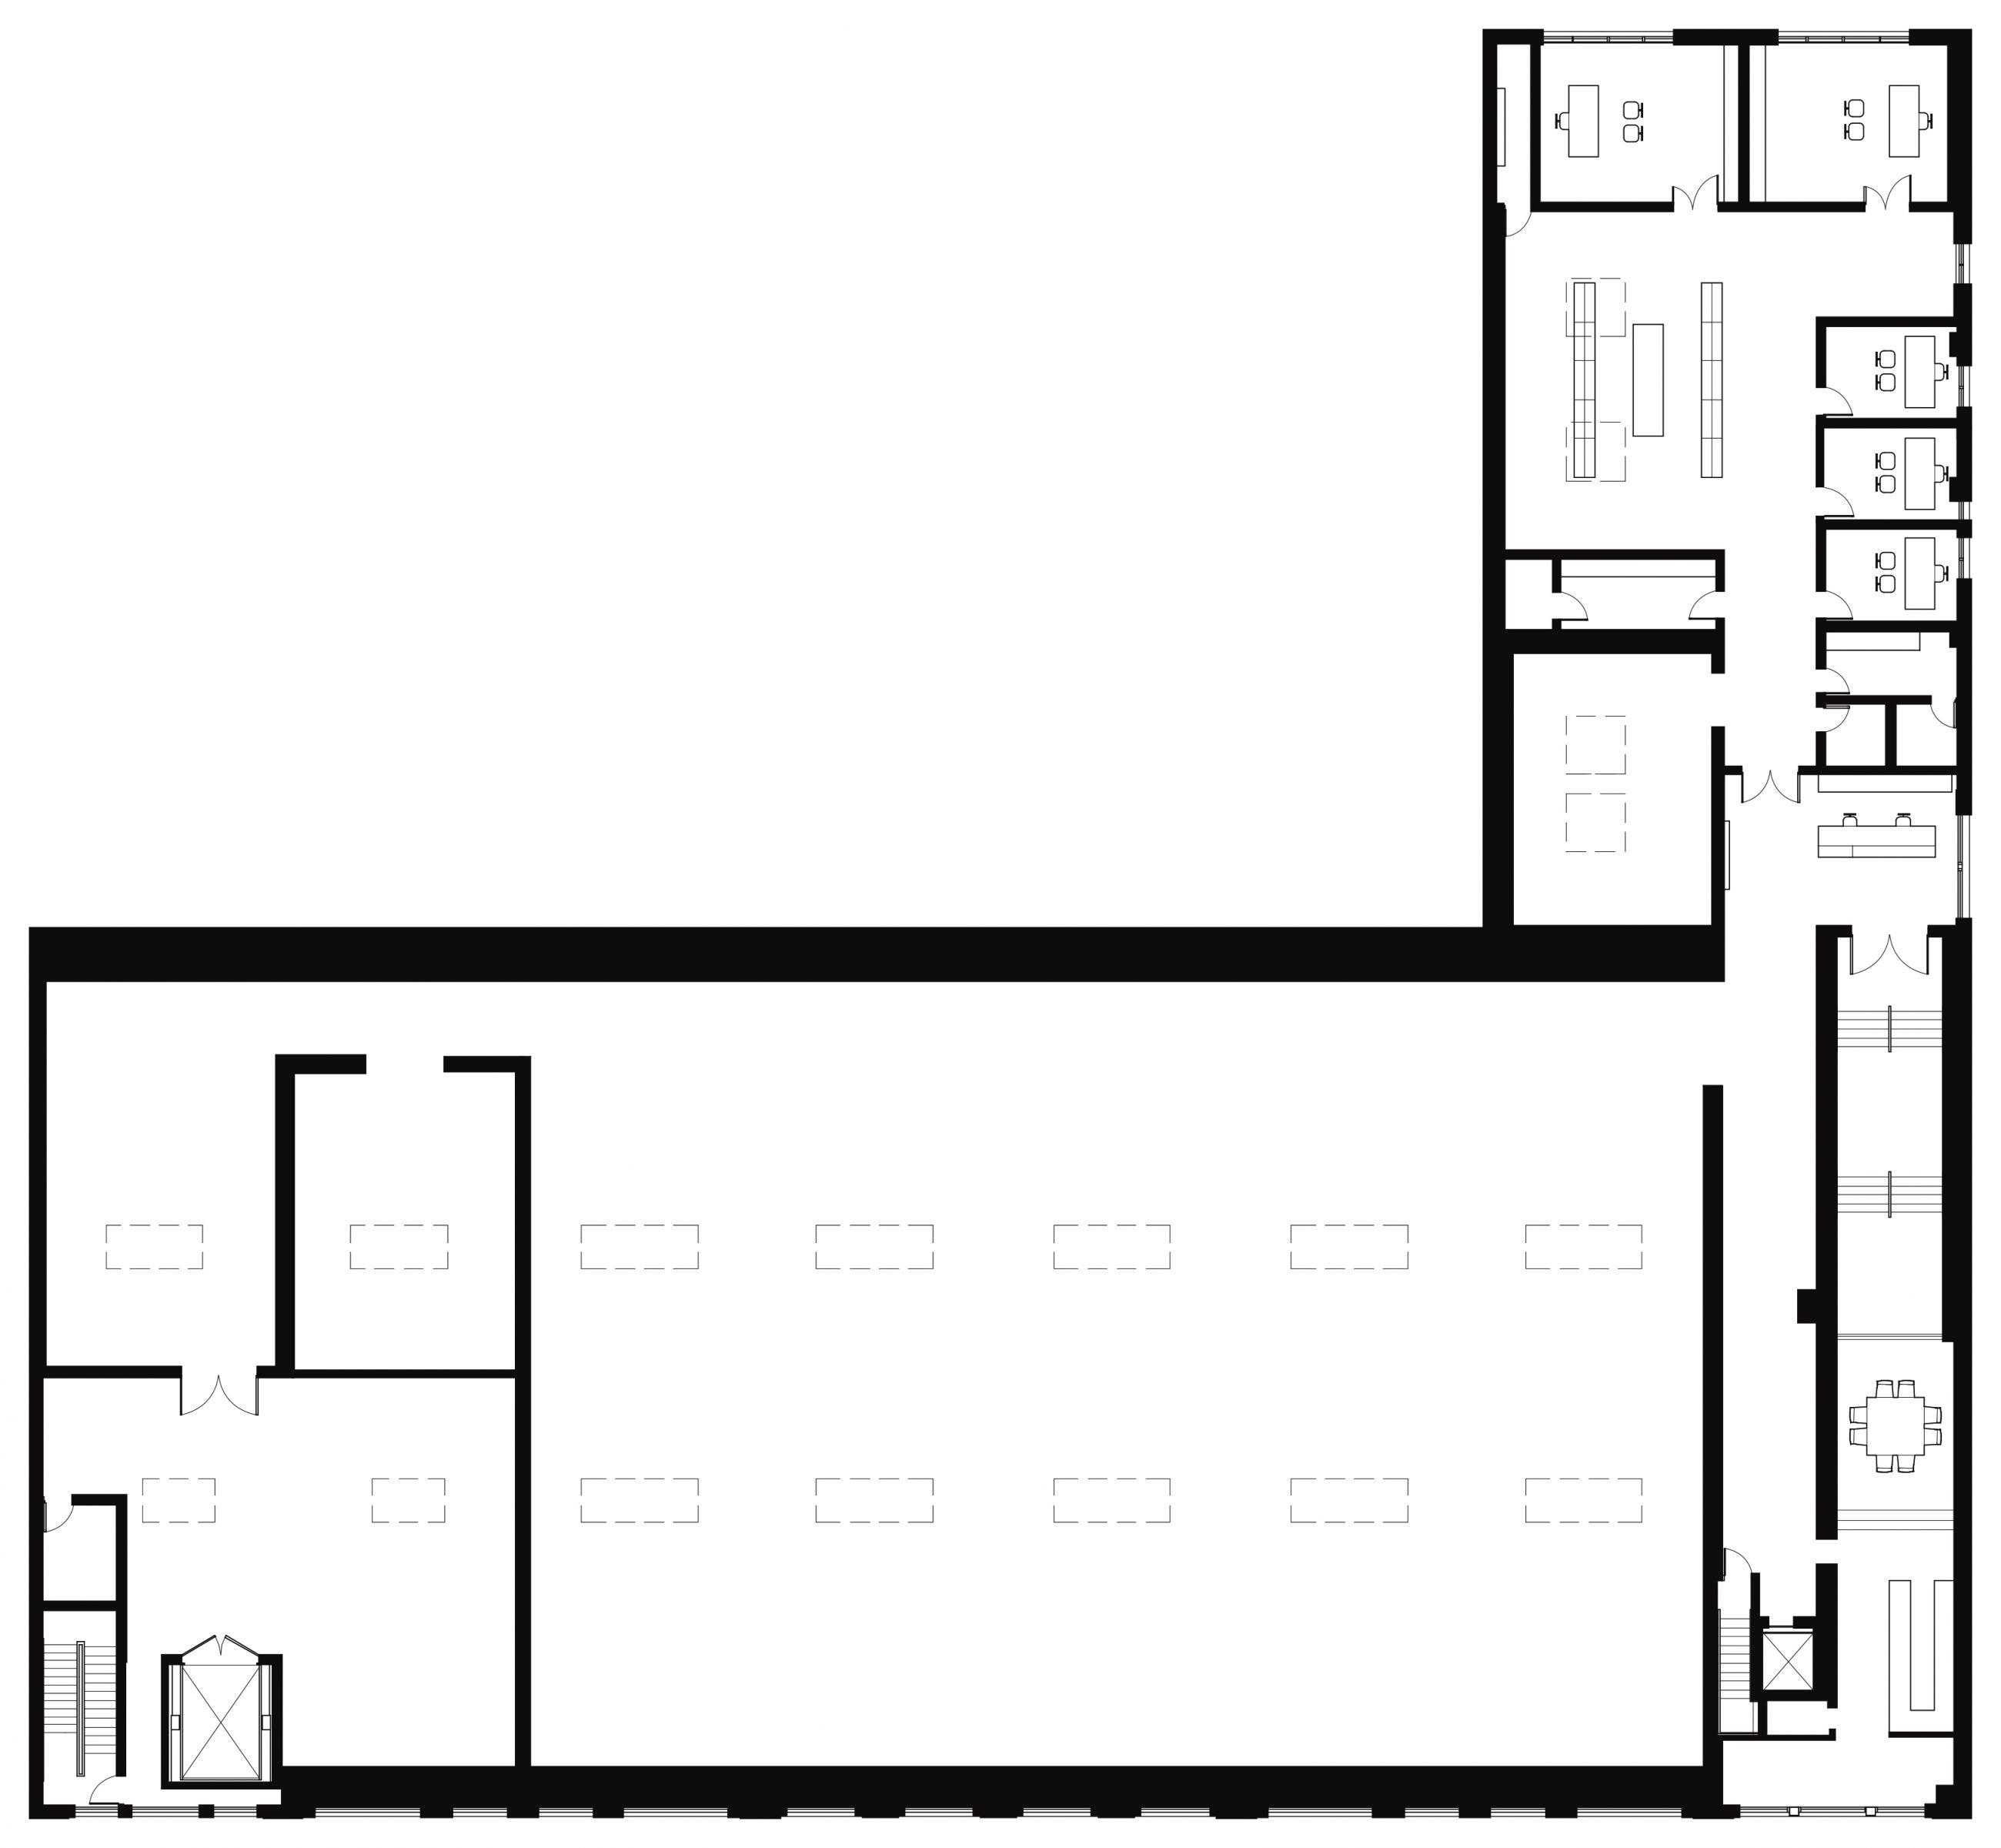 Hauser & Wirth 18th Street Plan